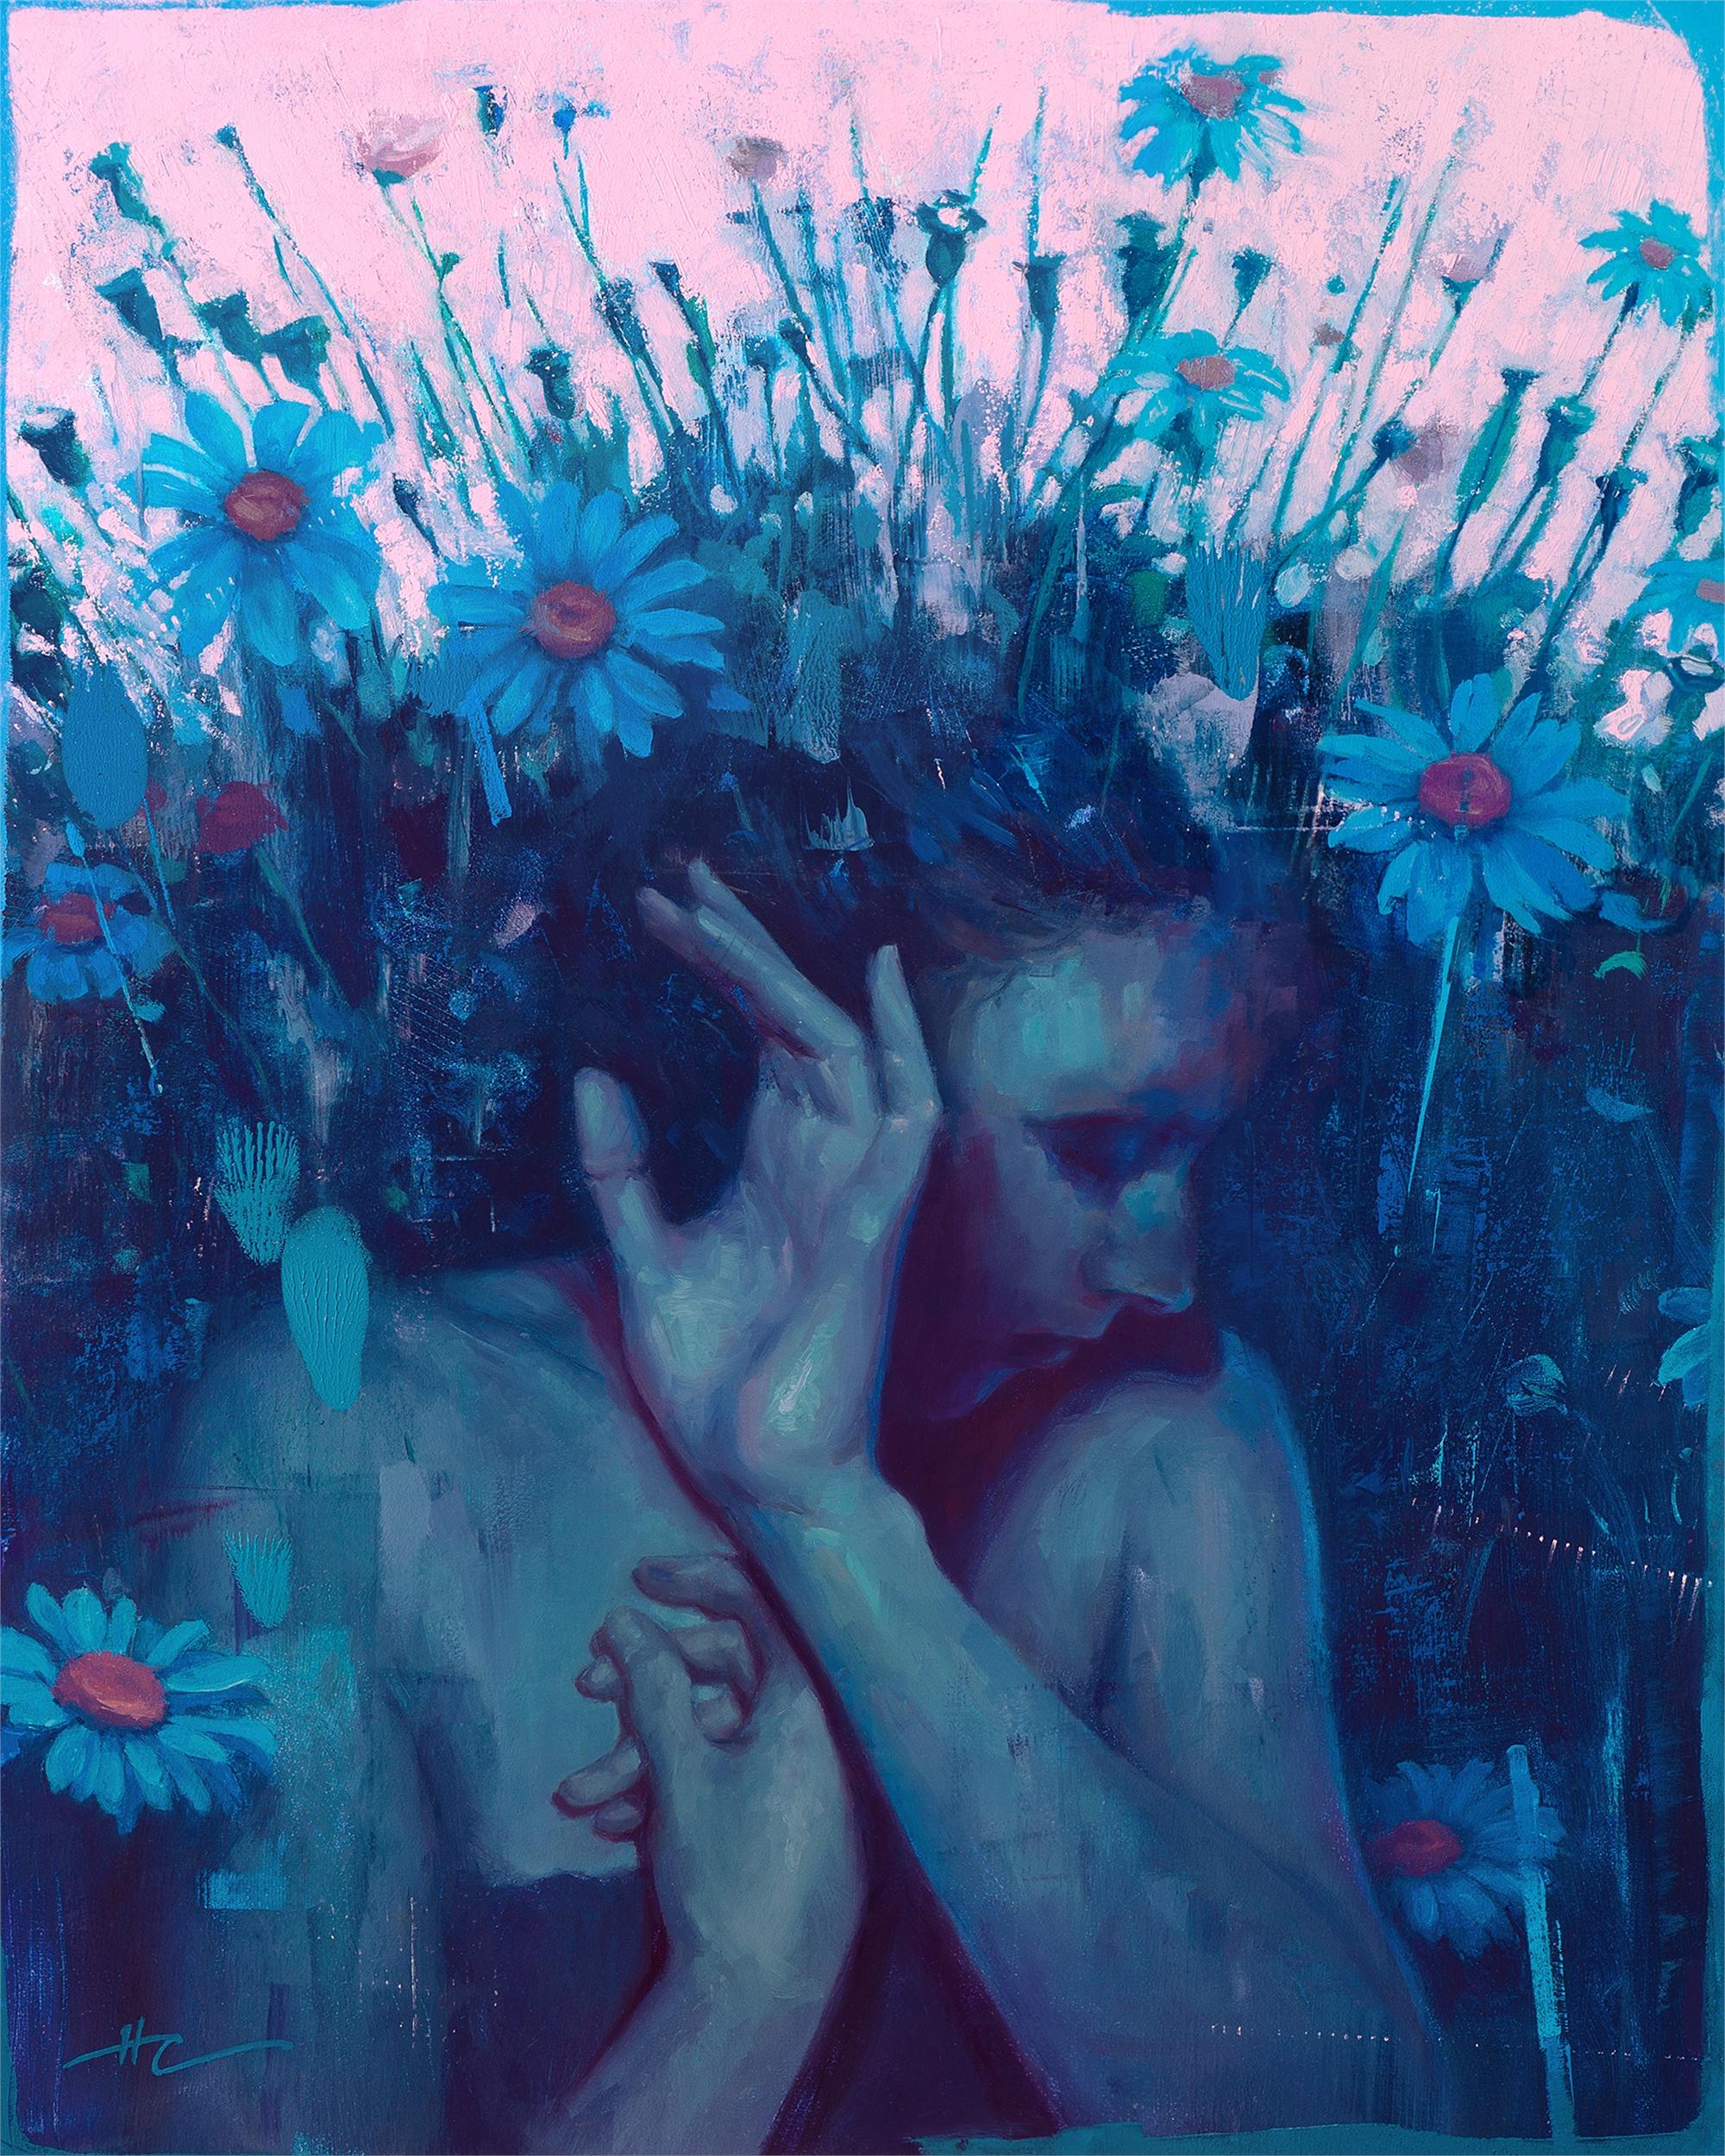 Undergrowth by Hilary Clarcq